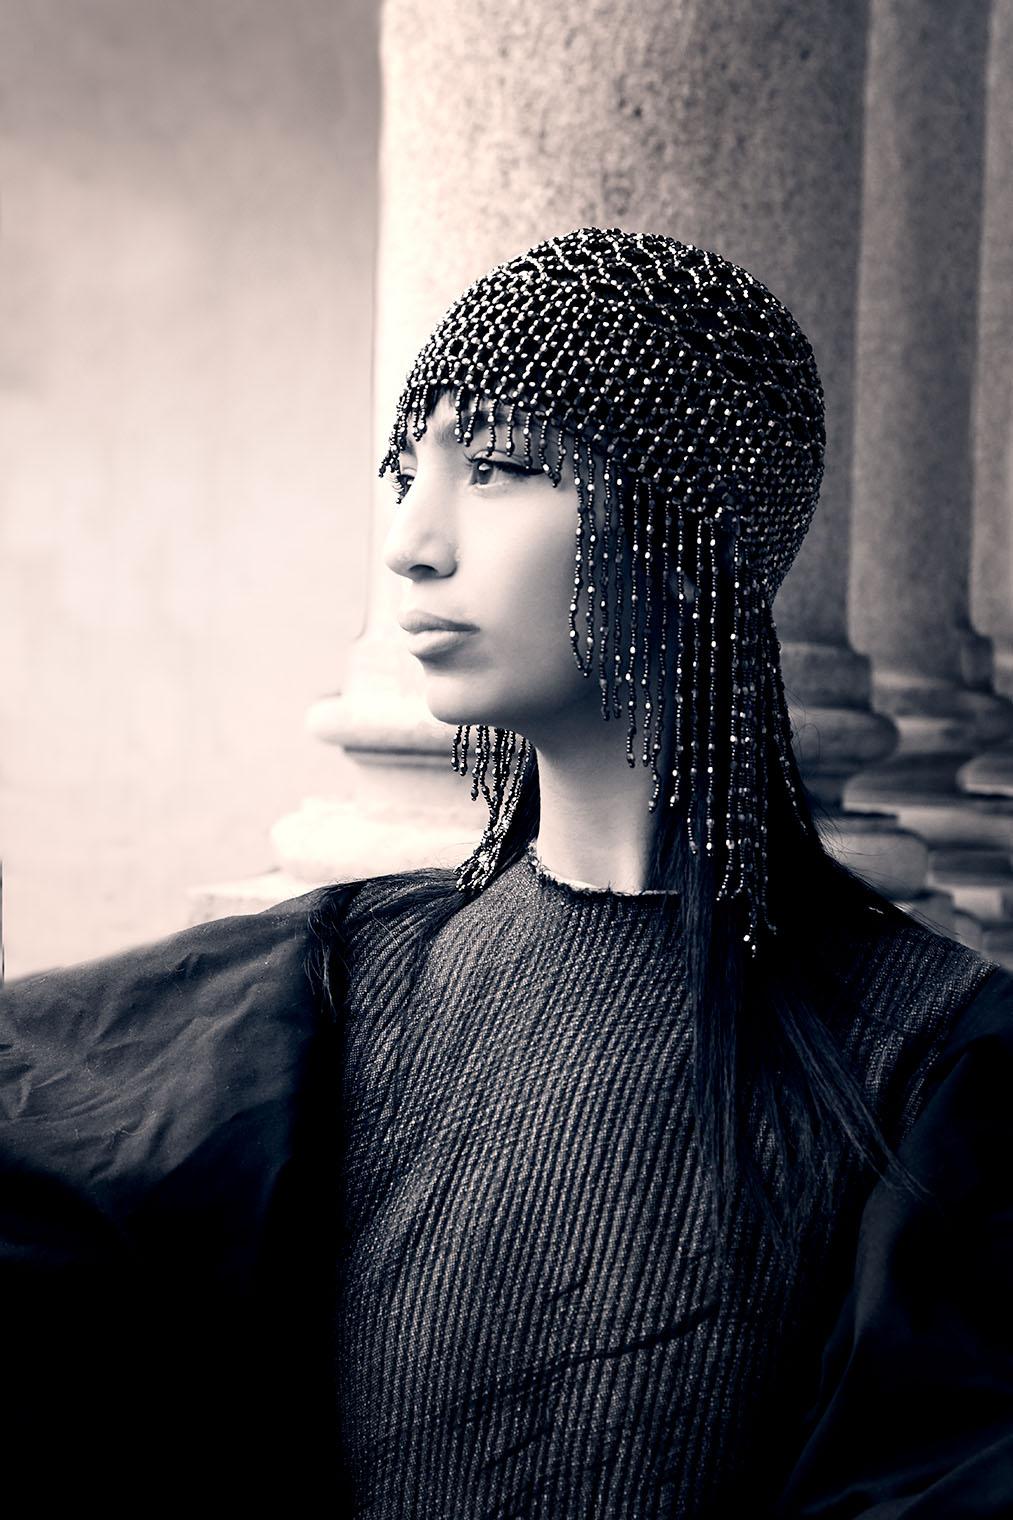 La Portrait Photographer 30s style girl jewelry headshot